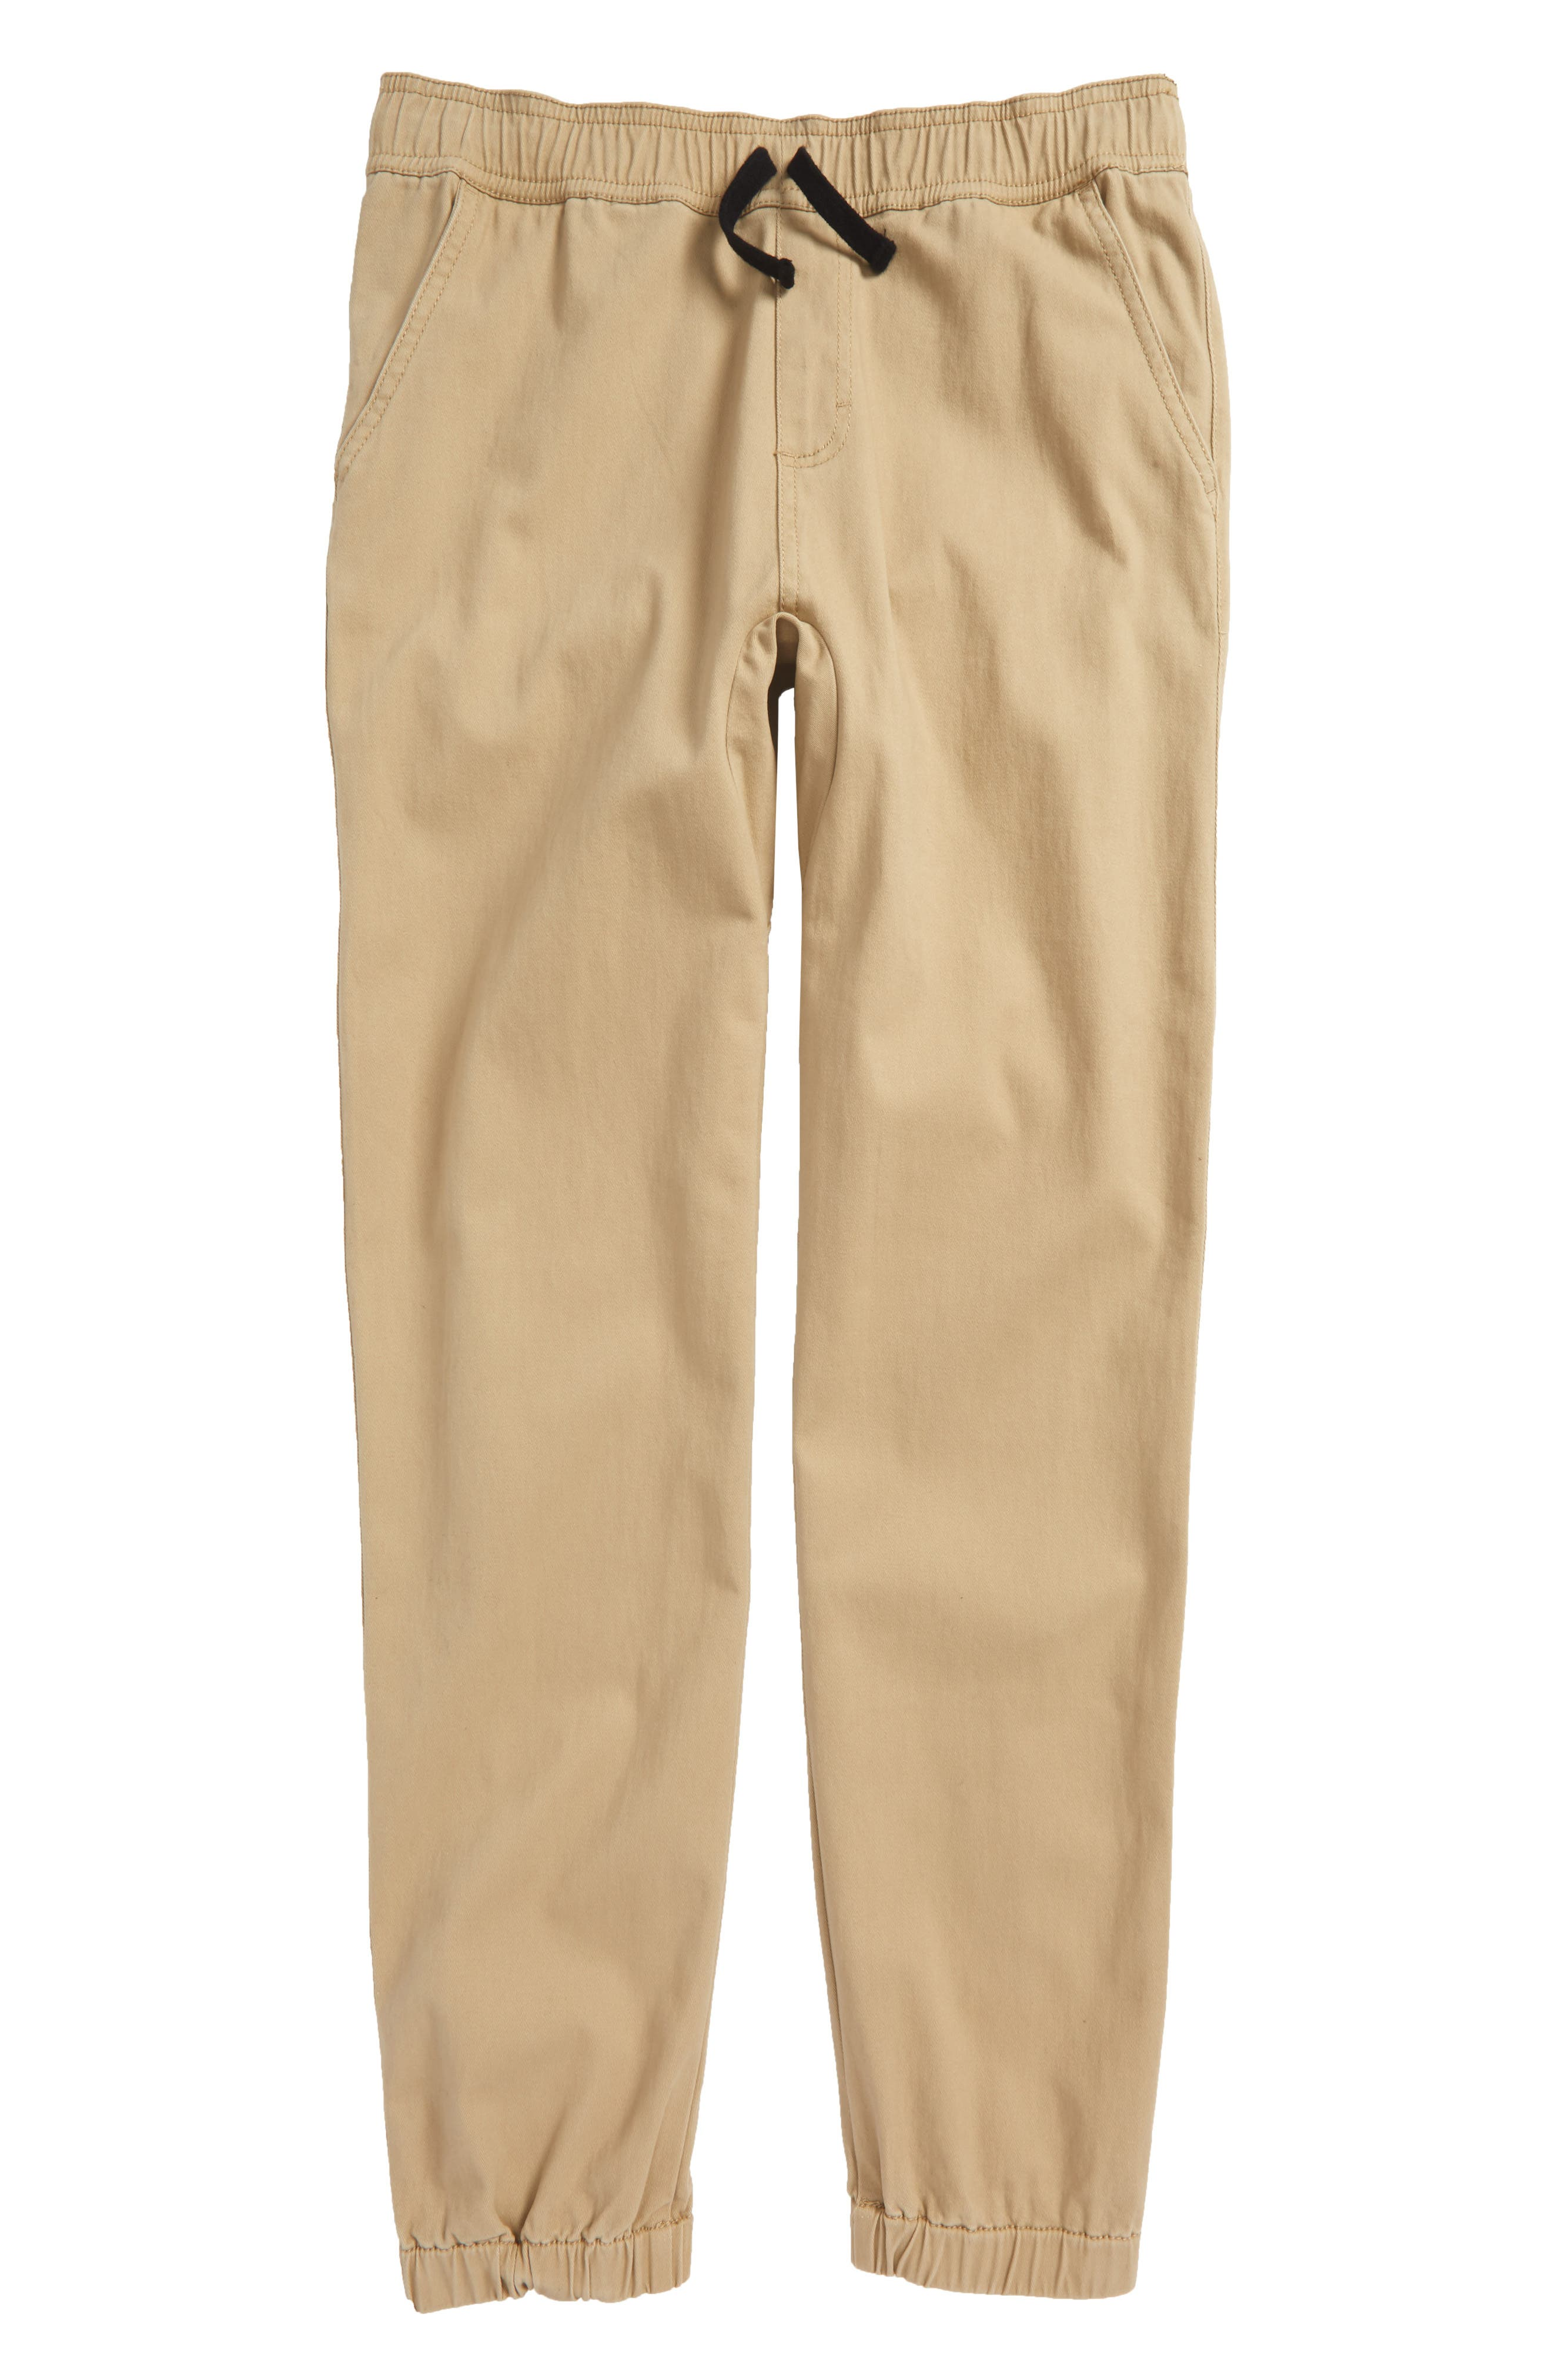 Woven Jogger Pants,                         Main,                         color, 230